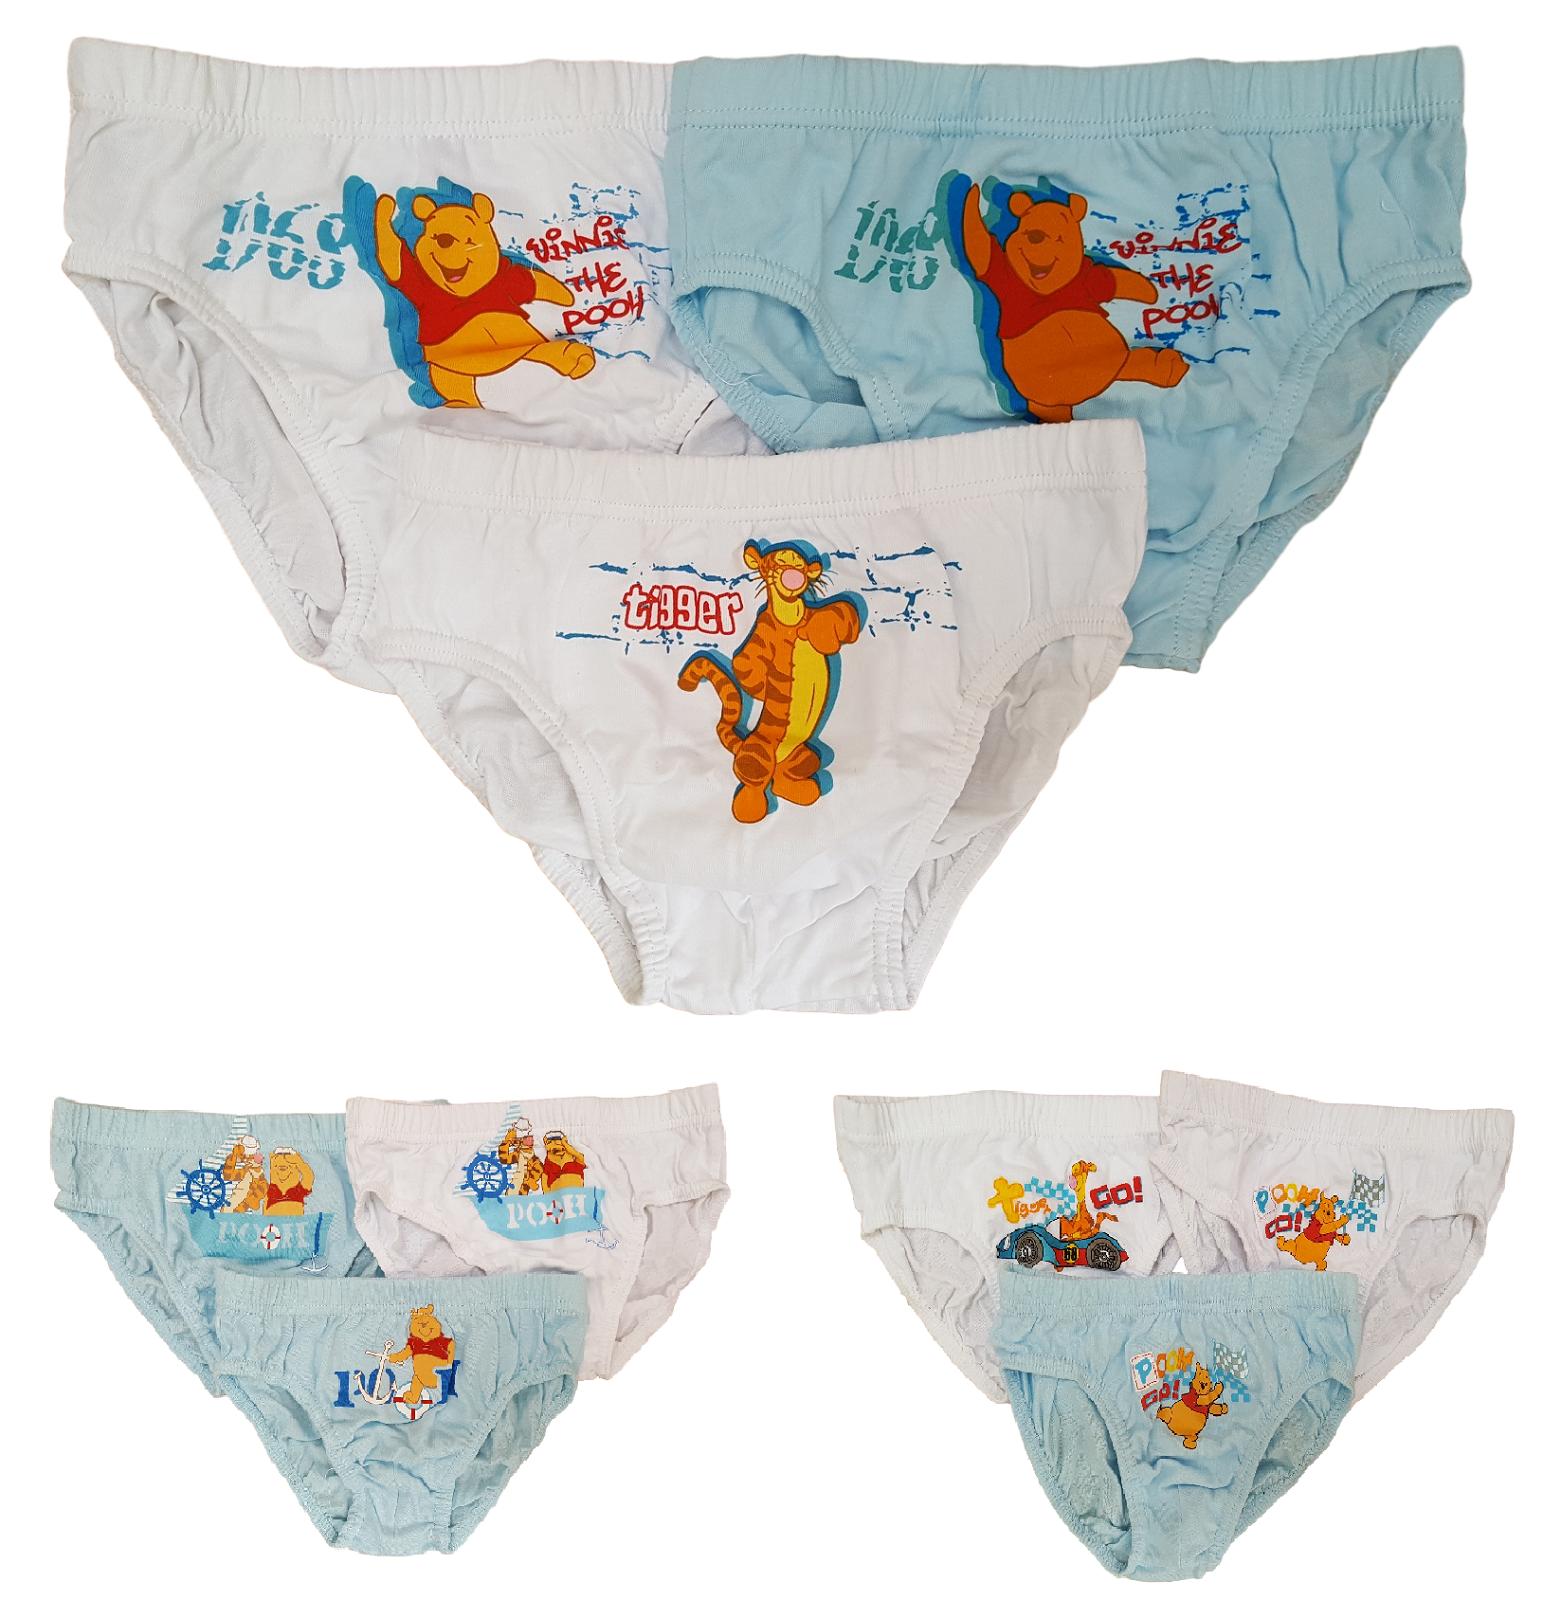 Boys 3 pack Winnie the Pooh briefs